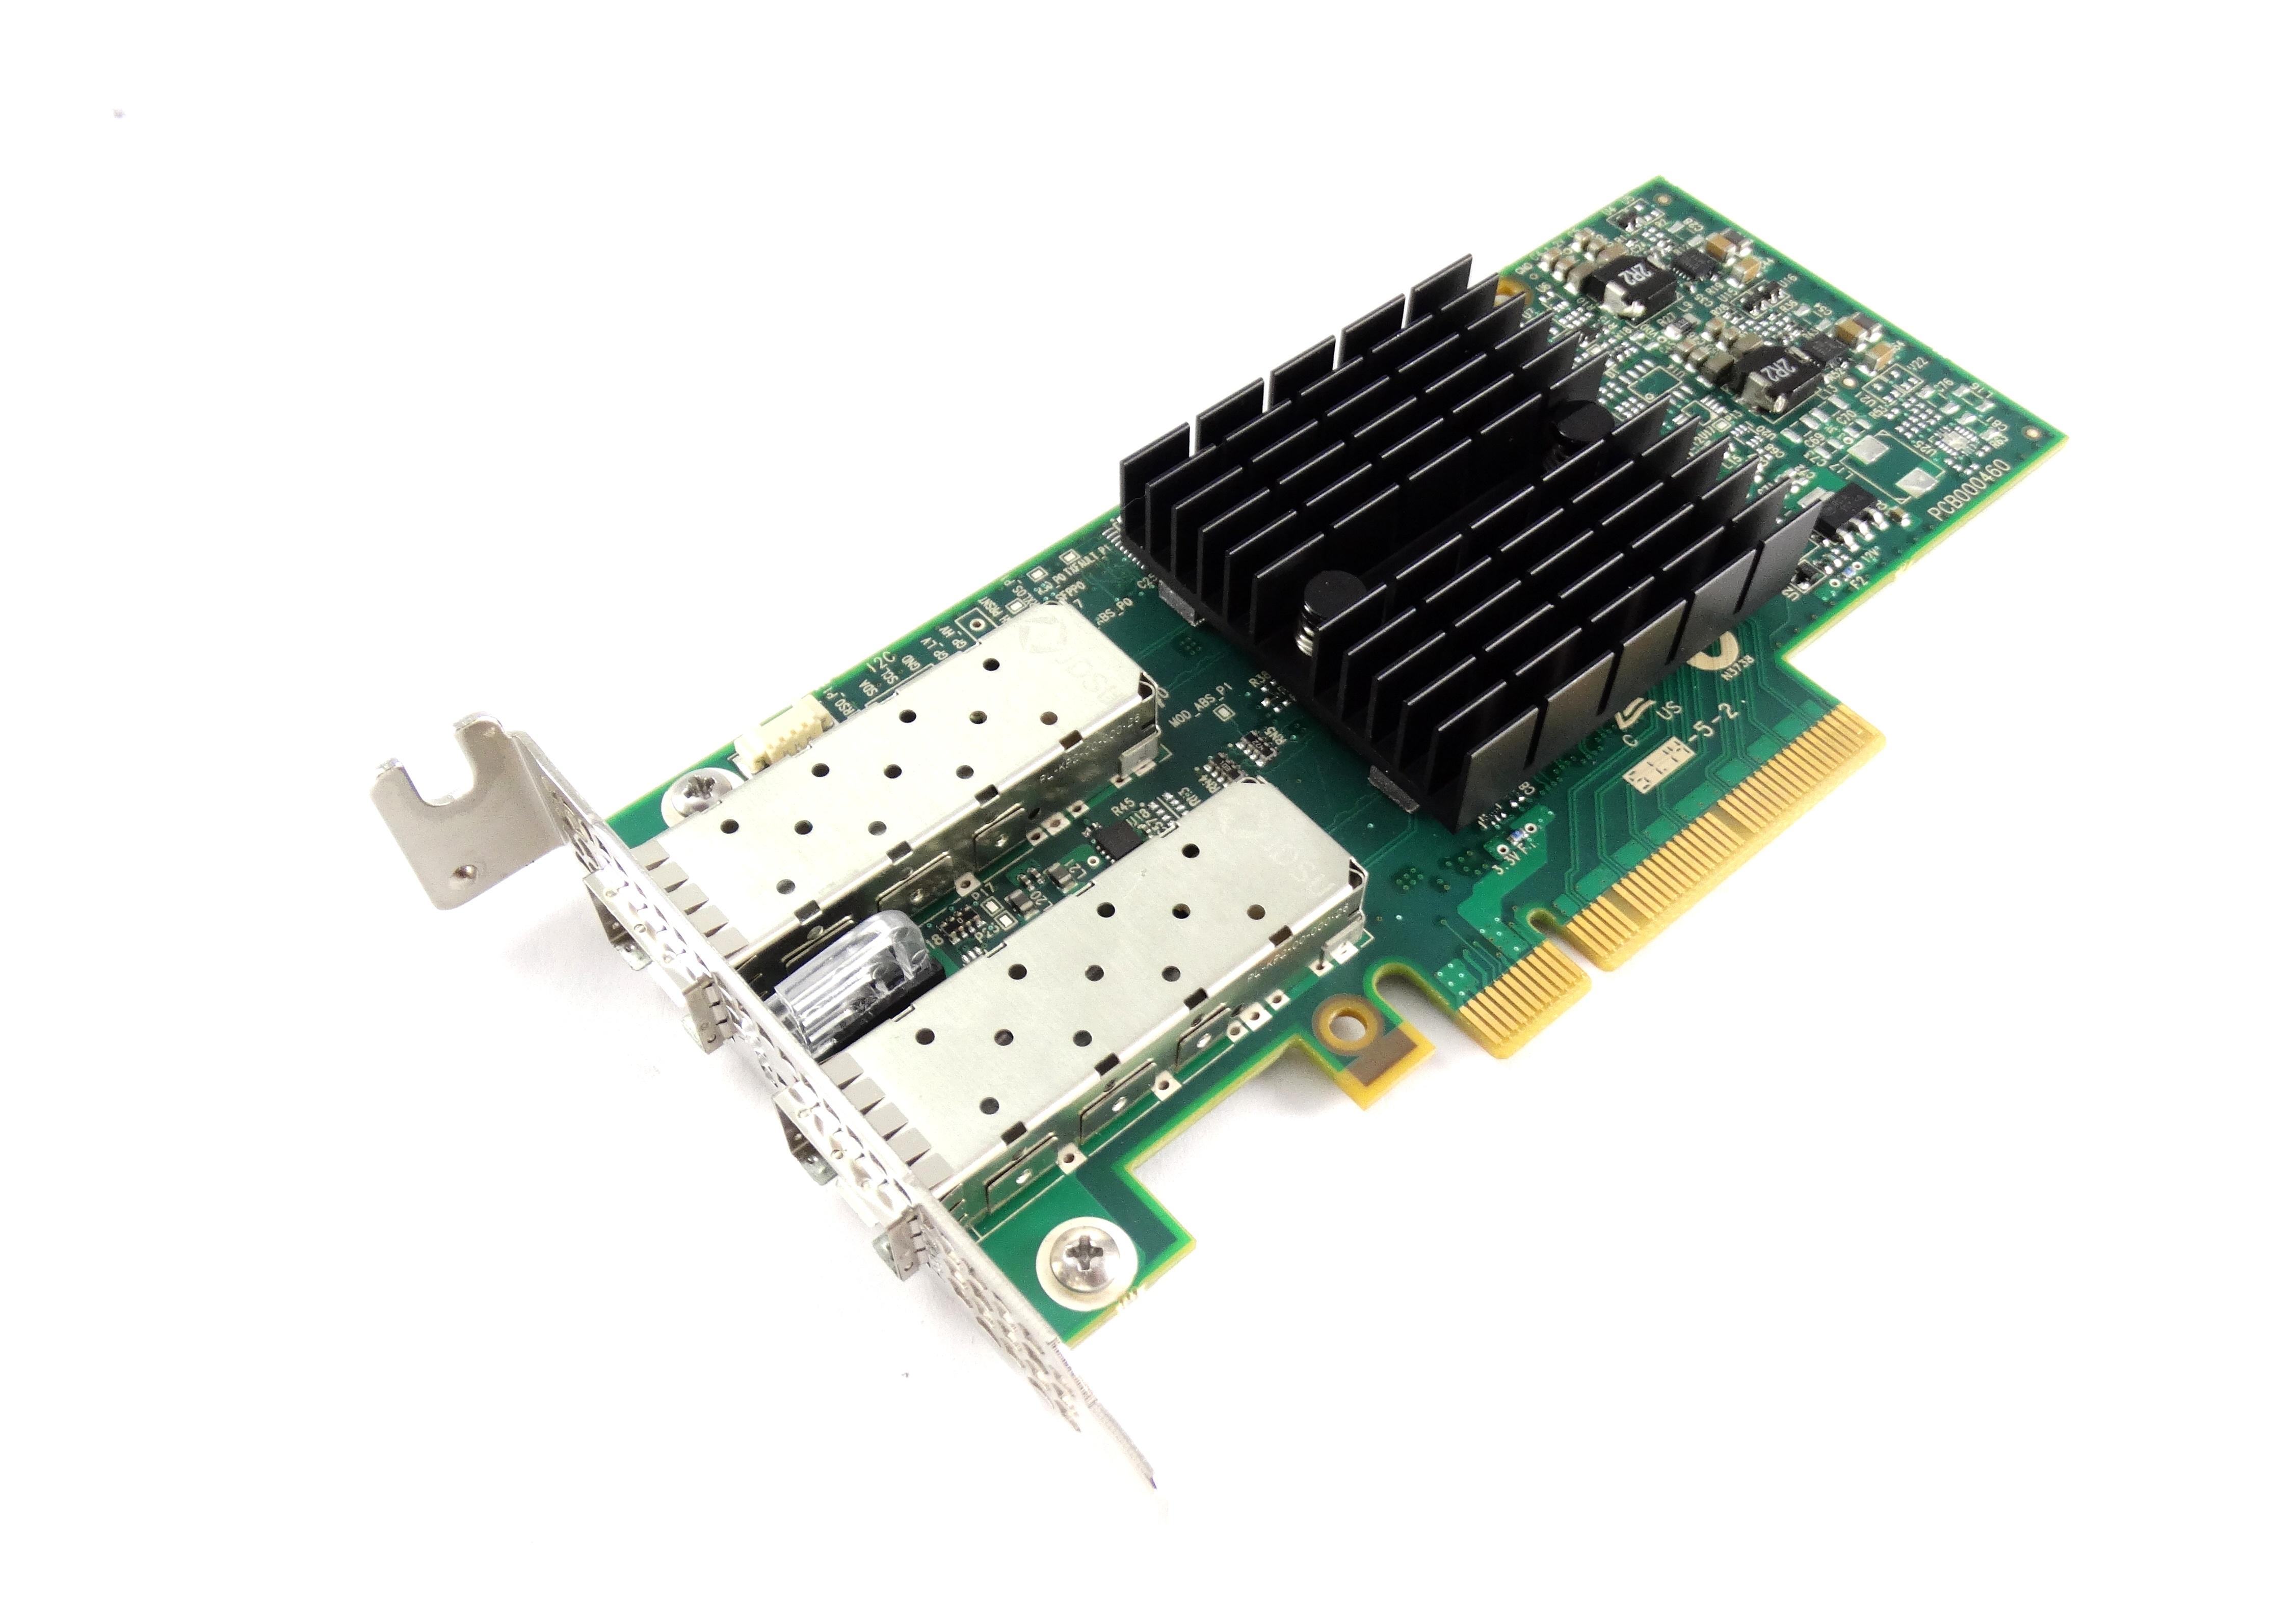 Mellanox Connectx-3 Pro En 10Gbe Dual Port Network Interface Card (MCX312C-XCCT)